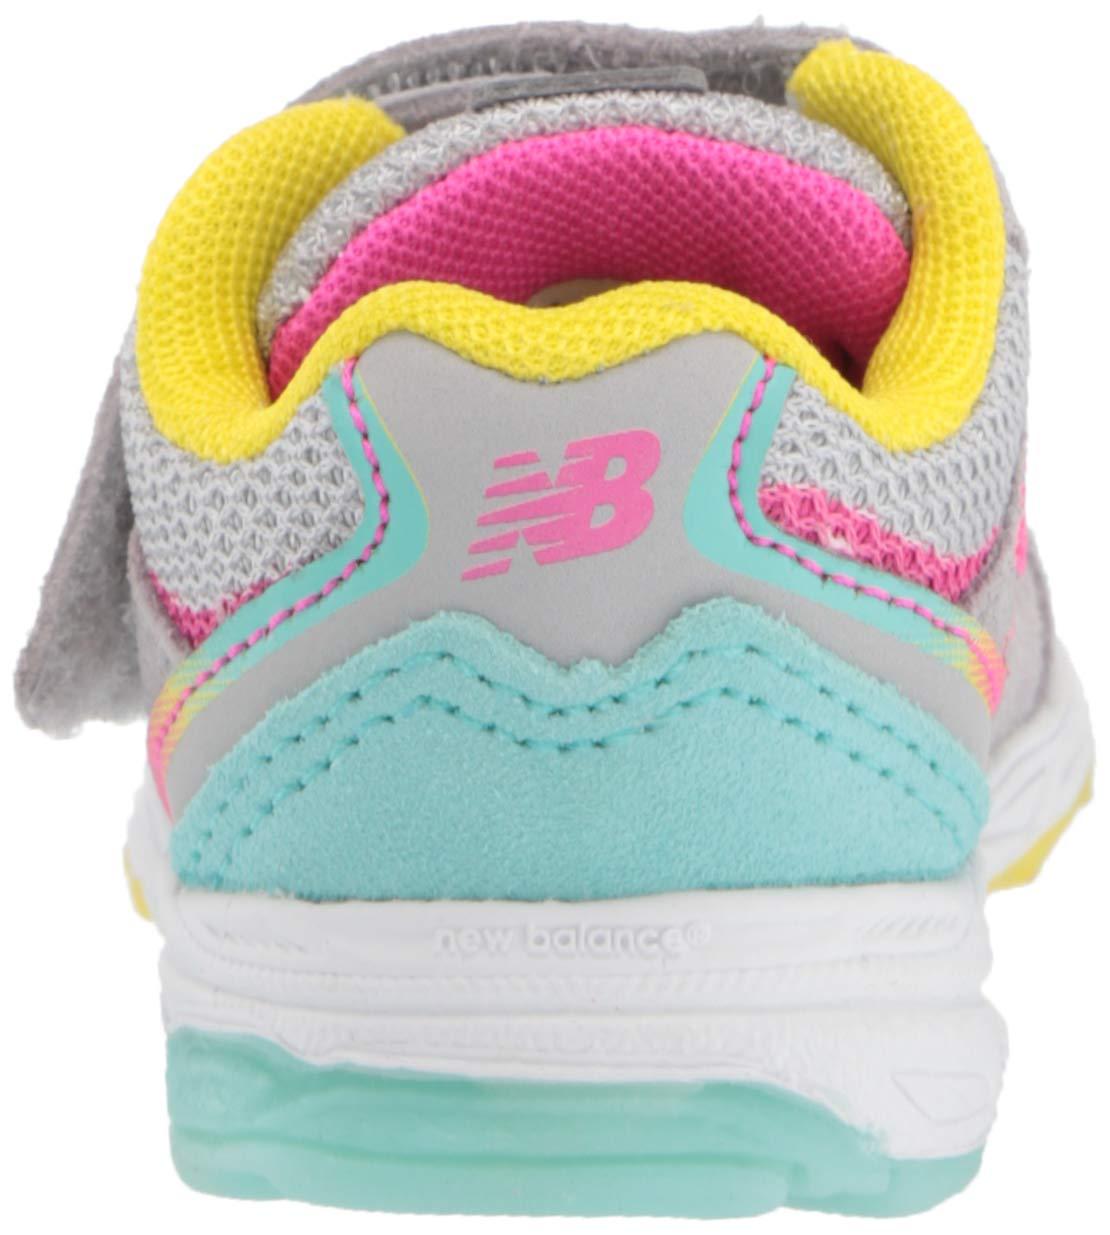 New Balance Girls' 888v2 Hook and Loop Running Shoe, Grey/Rainbow, 2 W US Infant by New Balance (Image #2)